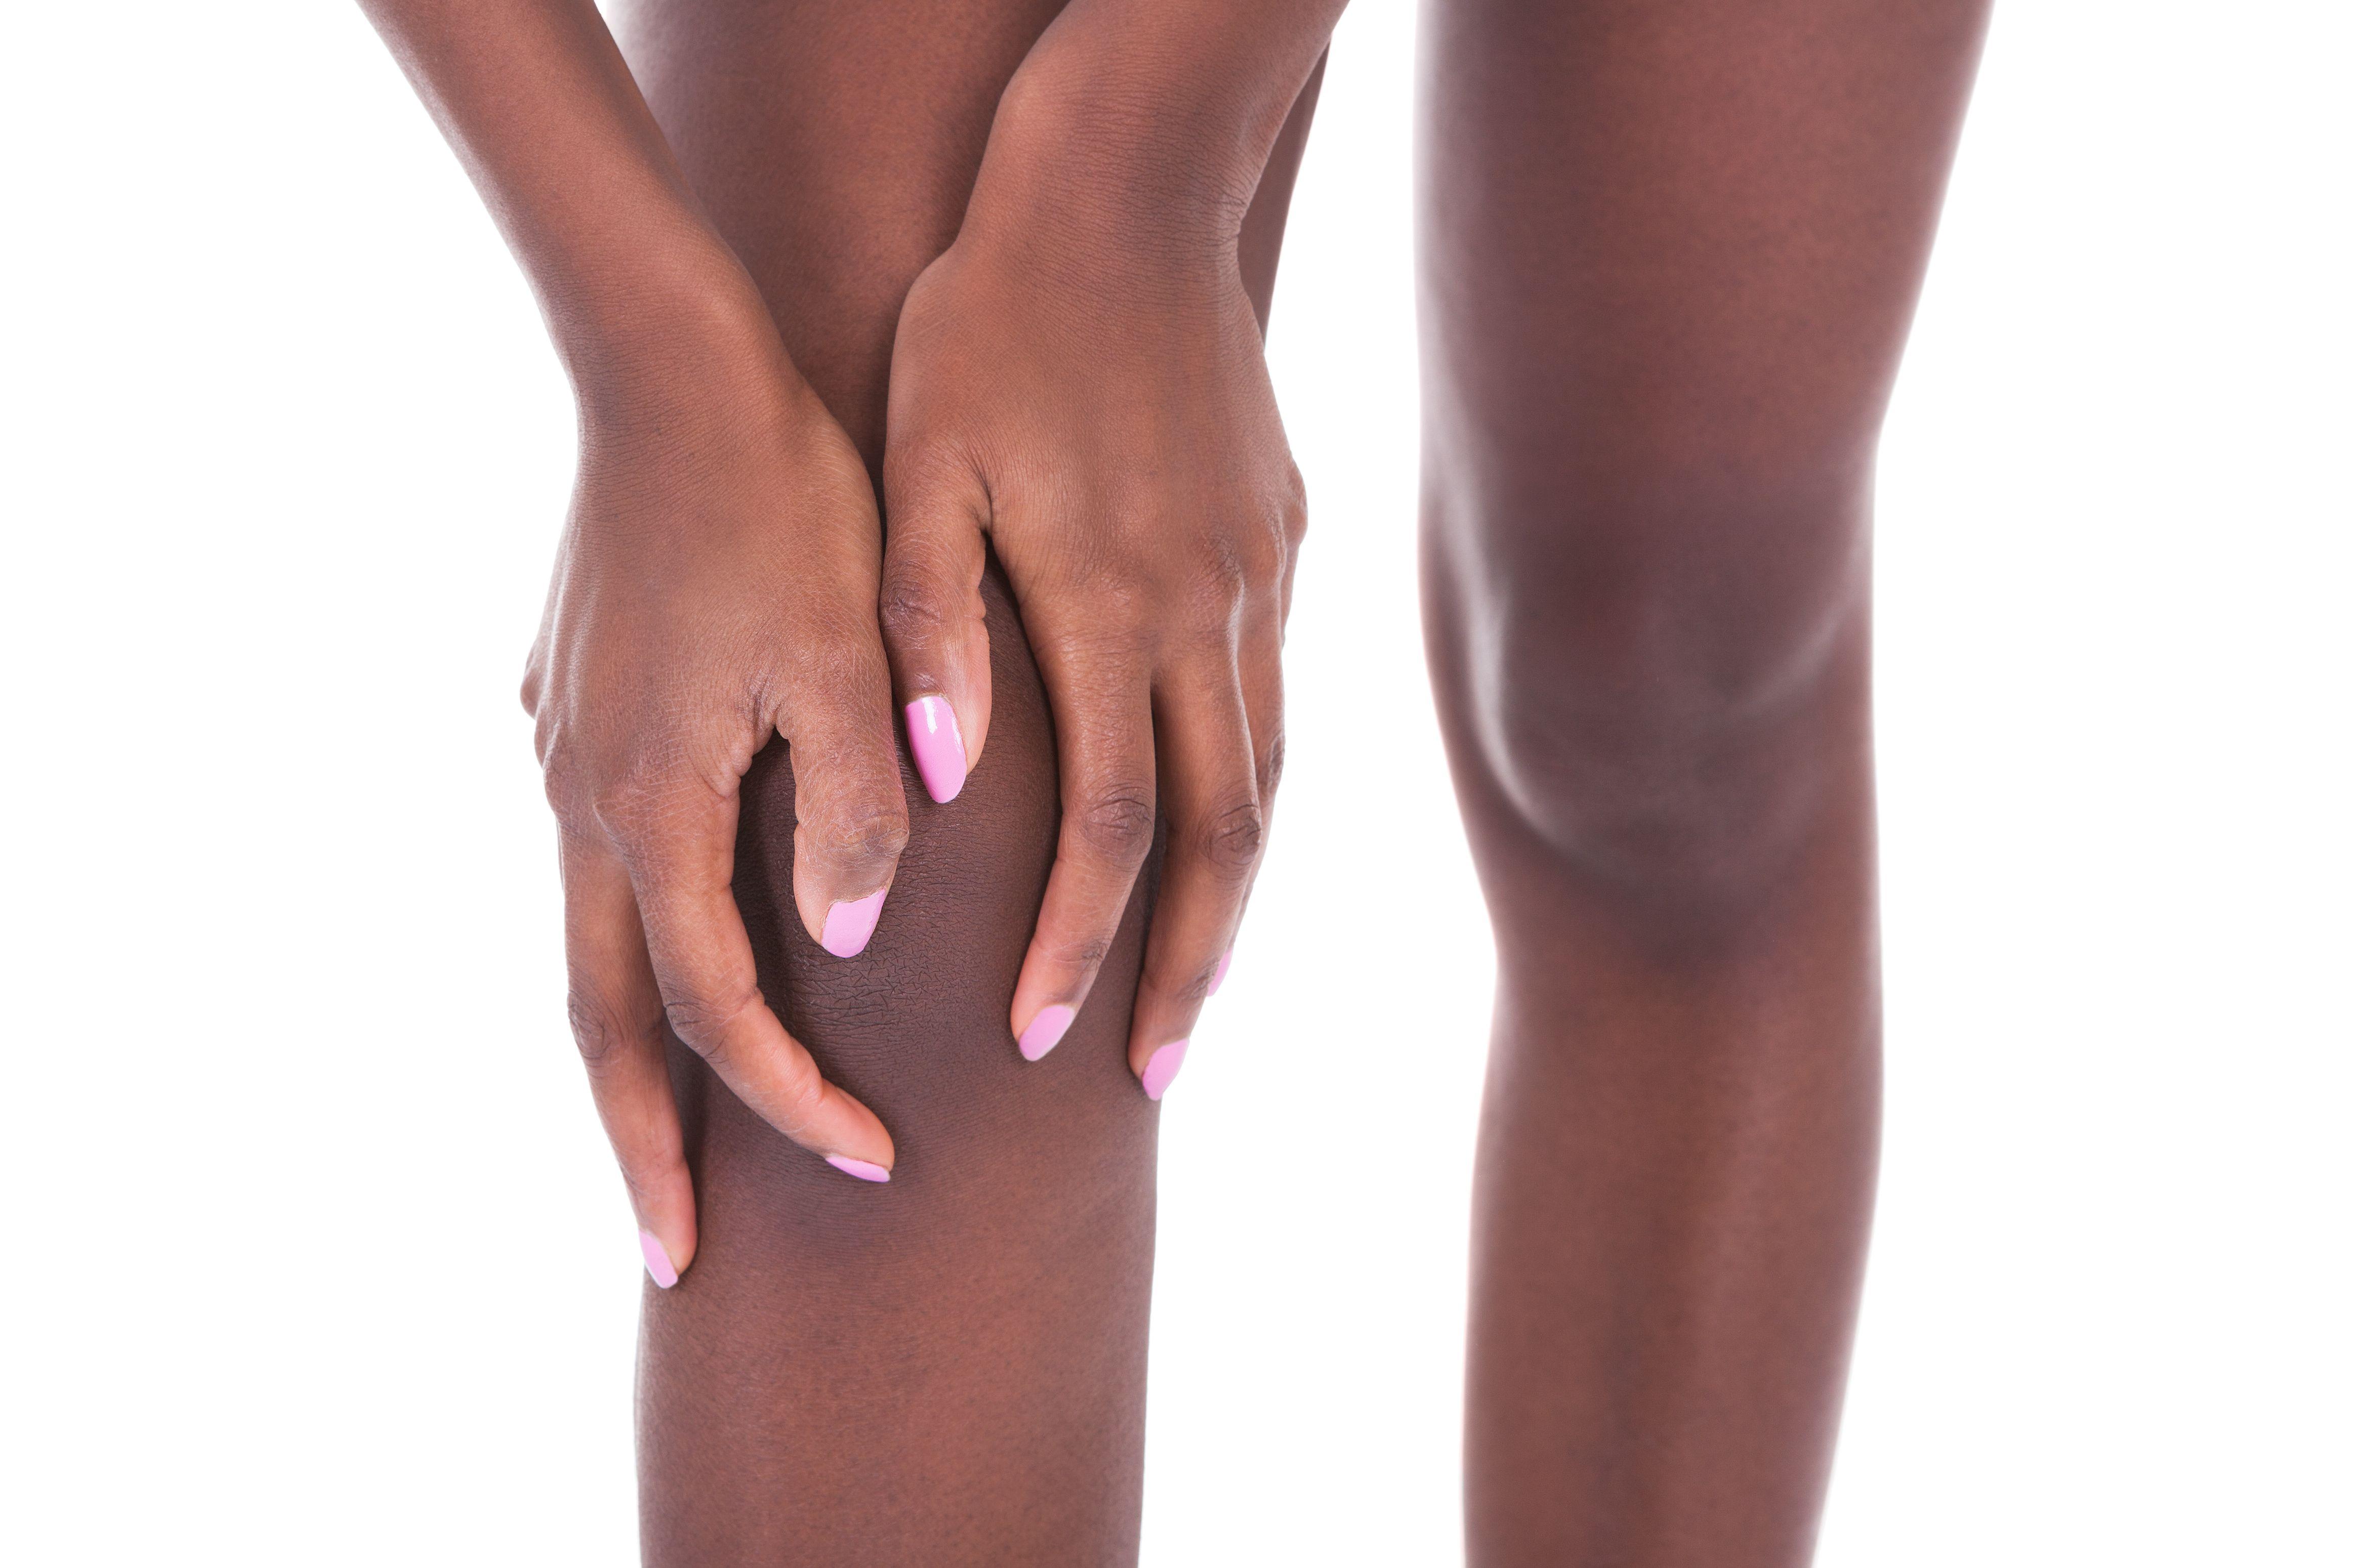 Rapid Onset Knee Osteoarthritis May be Overtreated: